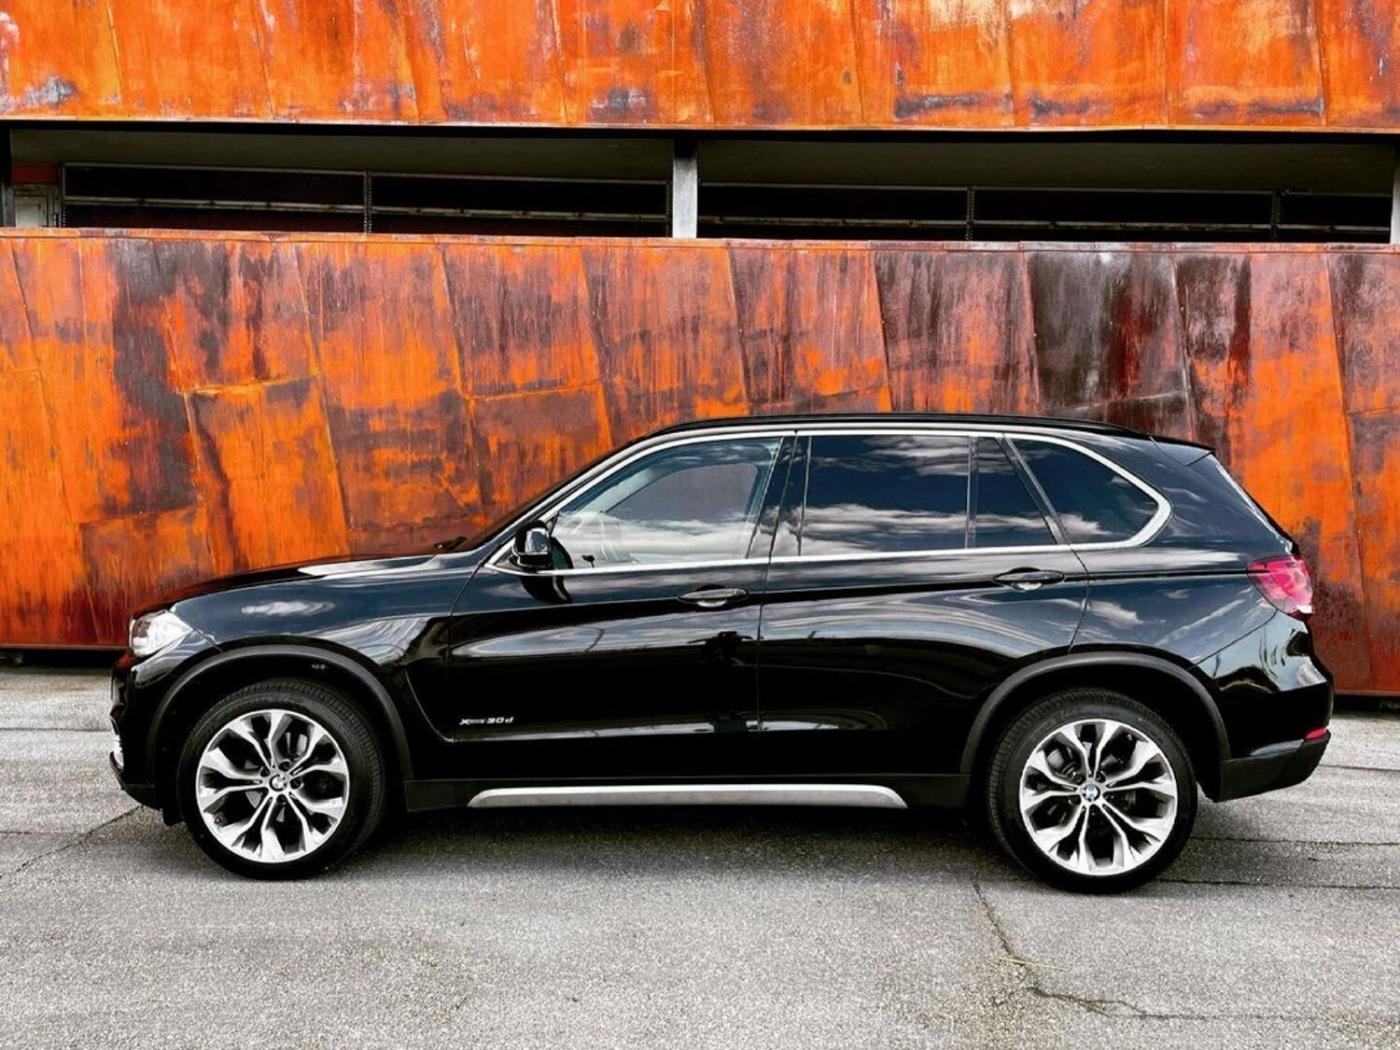 BMW-X5F15-ToutsurlAdBlue-6.jpeg